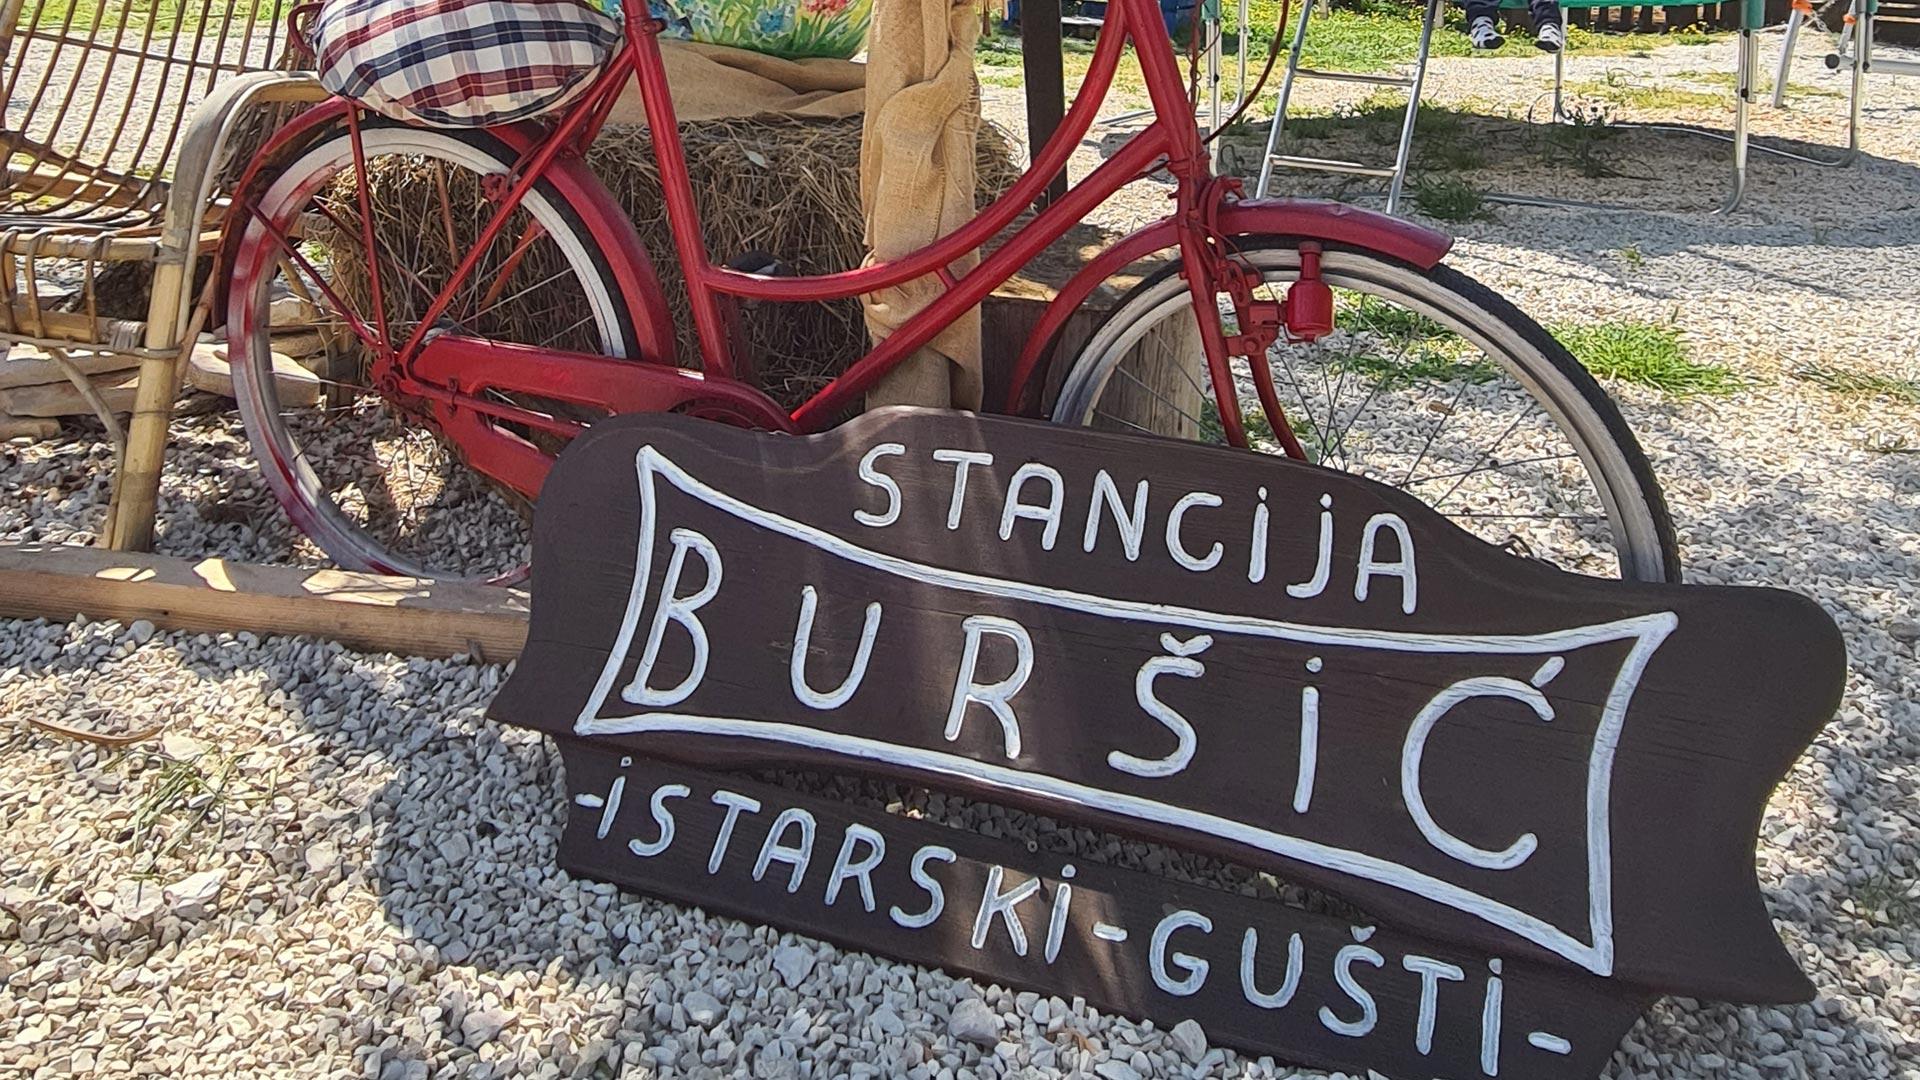 Stancija Buršić - Prosciutto and Istrian delicates